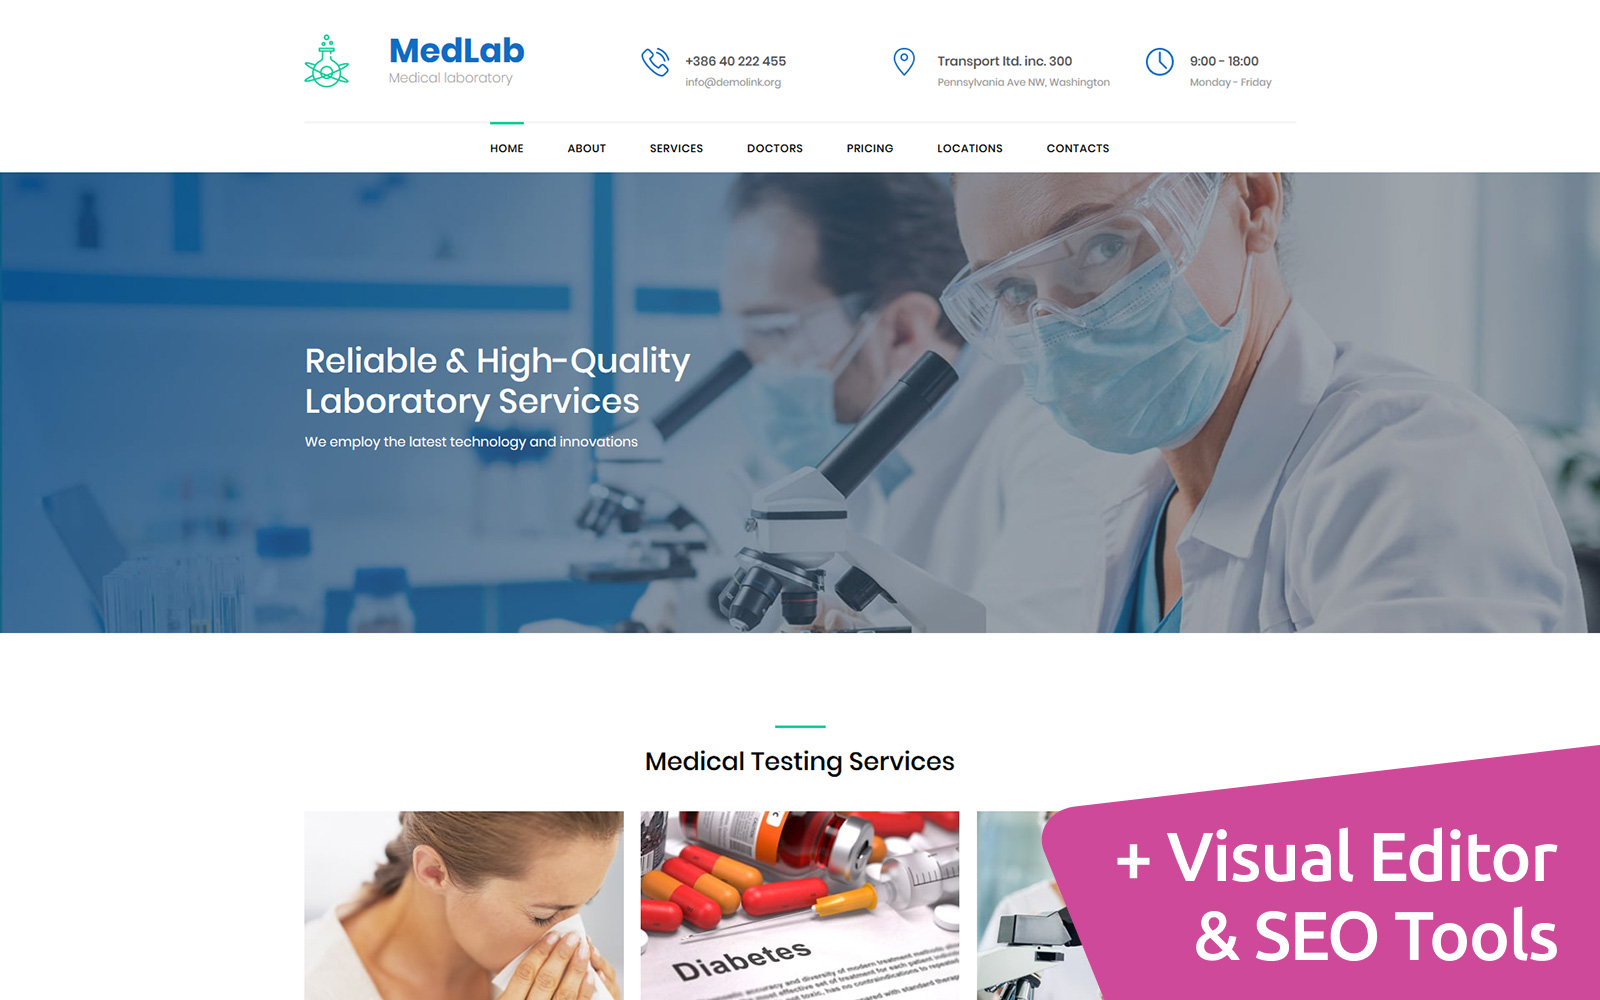 Medical Laboratory Premium Templates Moto CMS 3 №66403